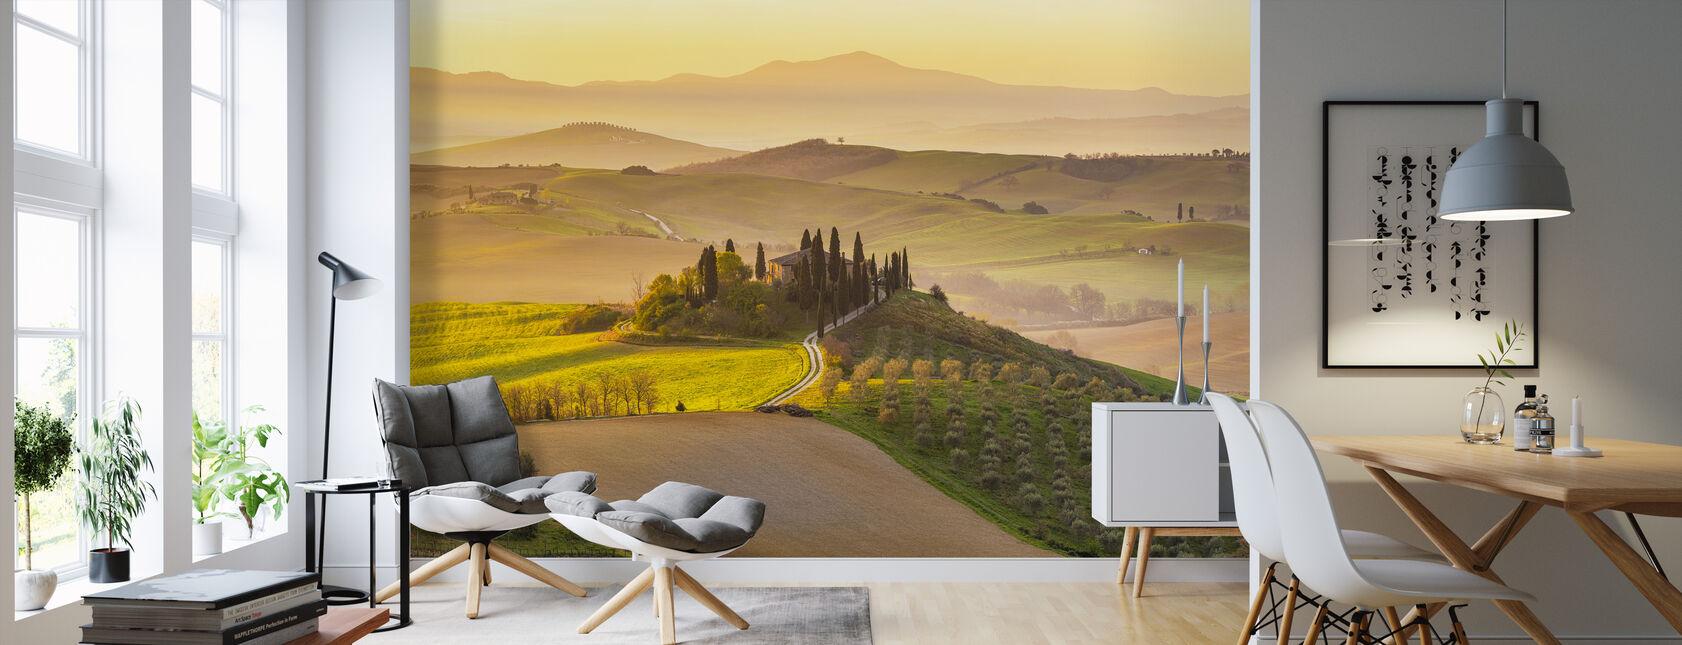 Tuscany Vineyard - Wallpaper - Living Room